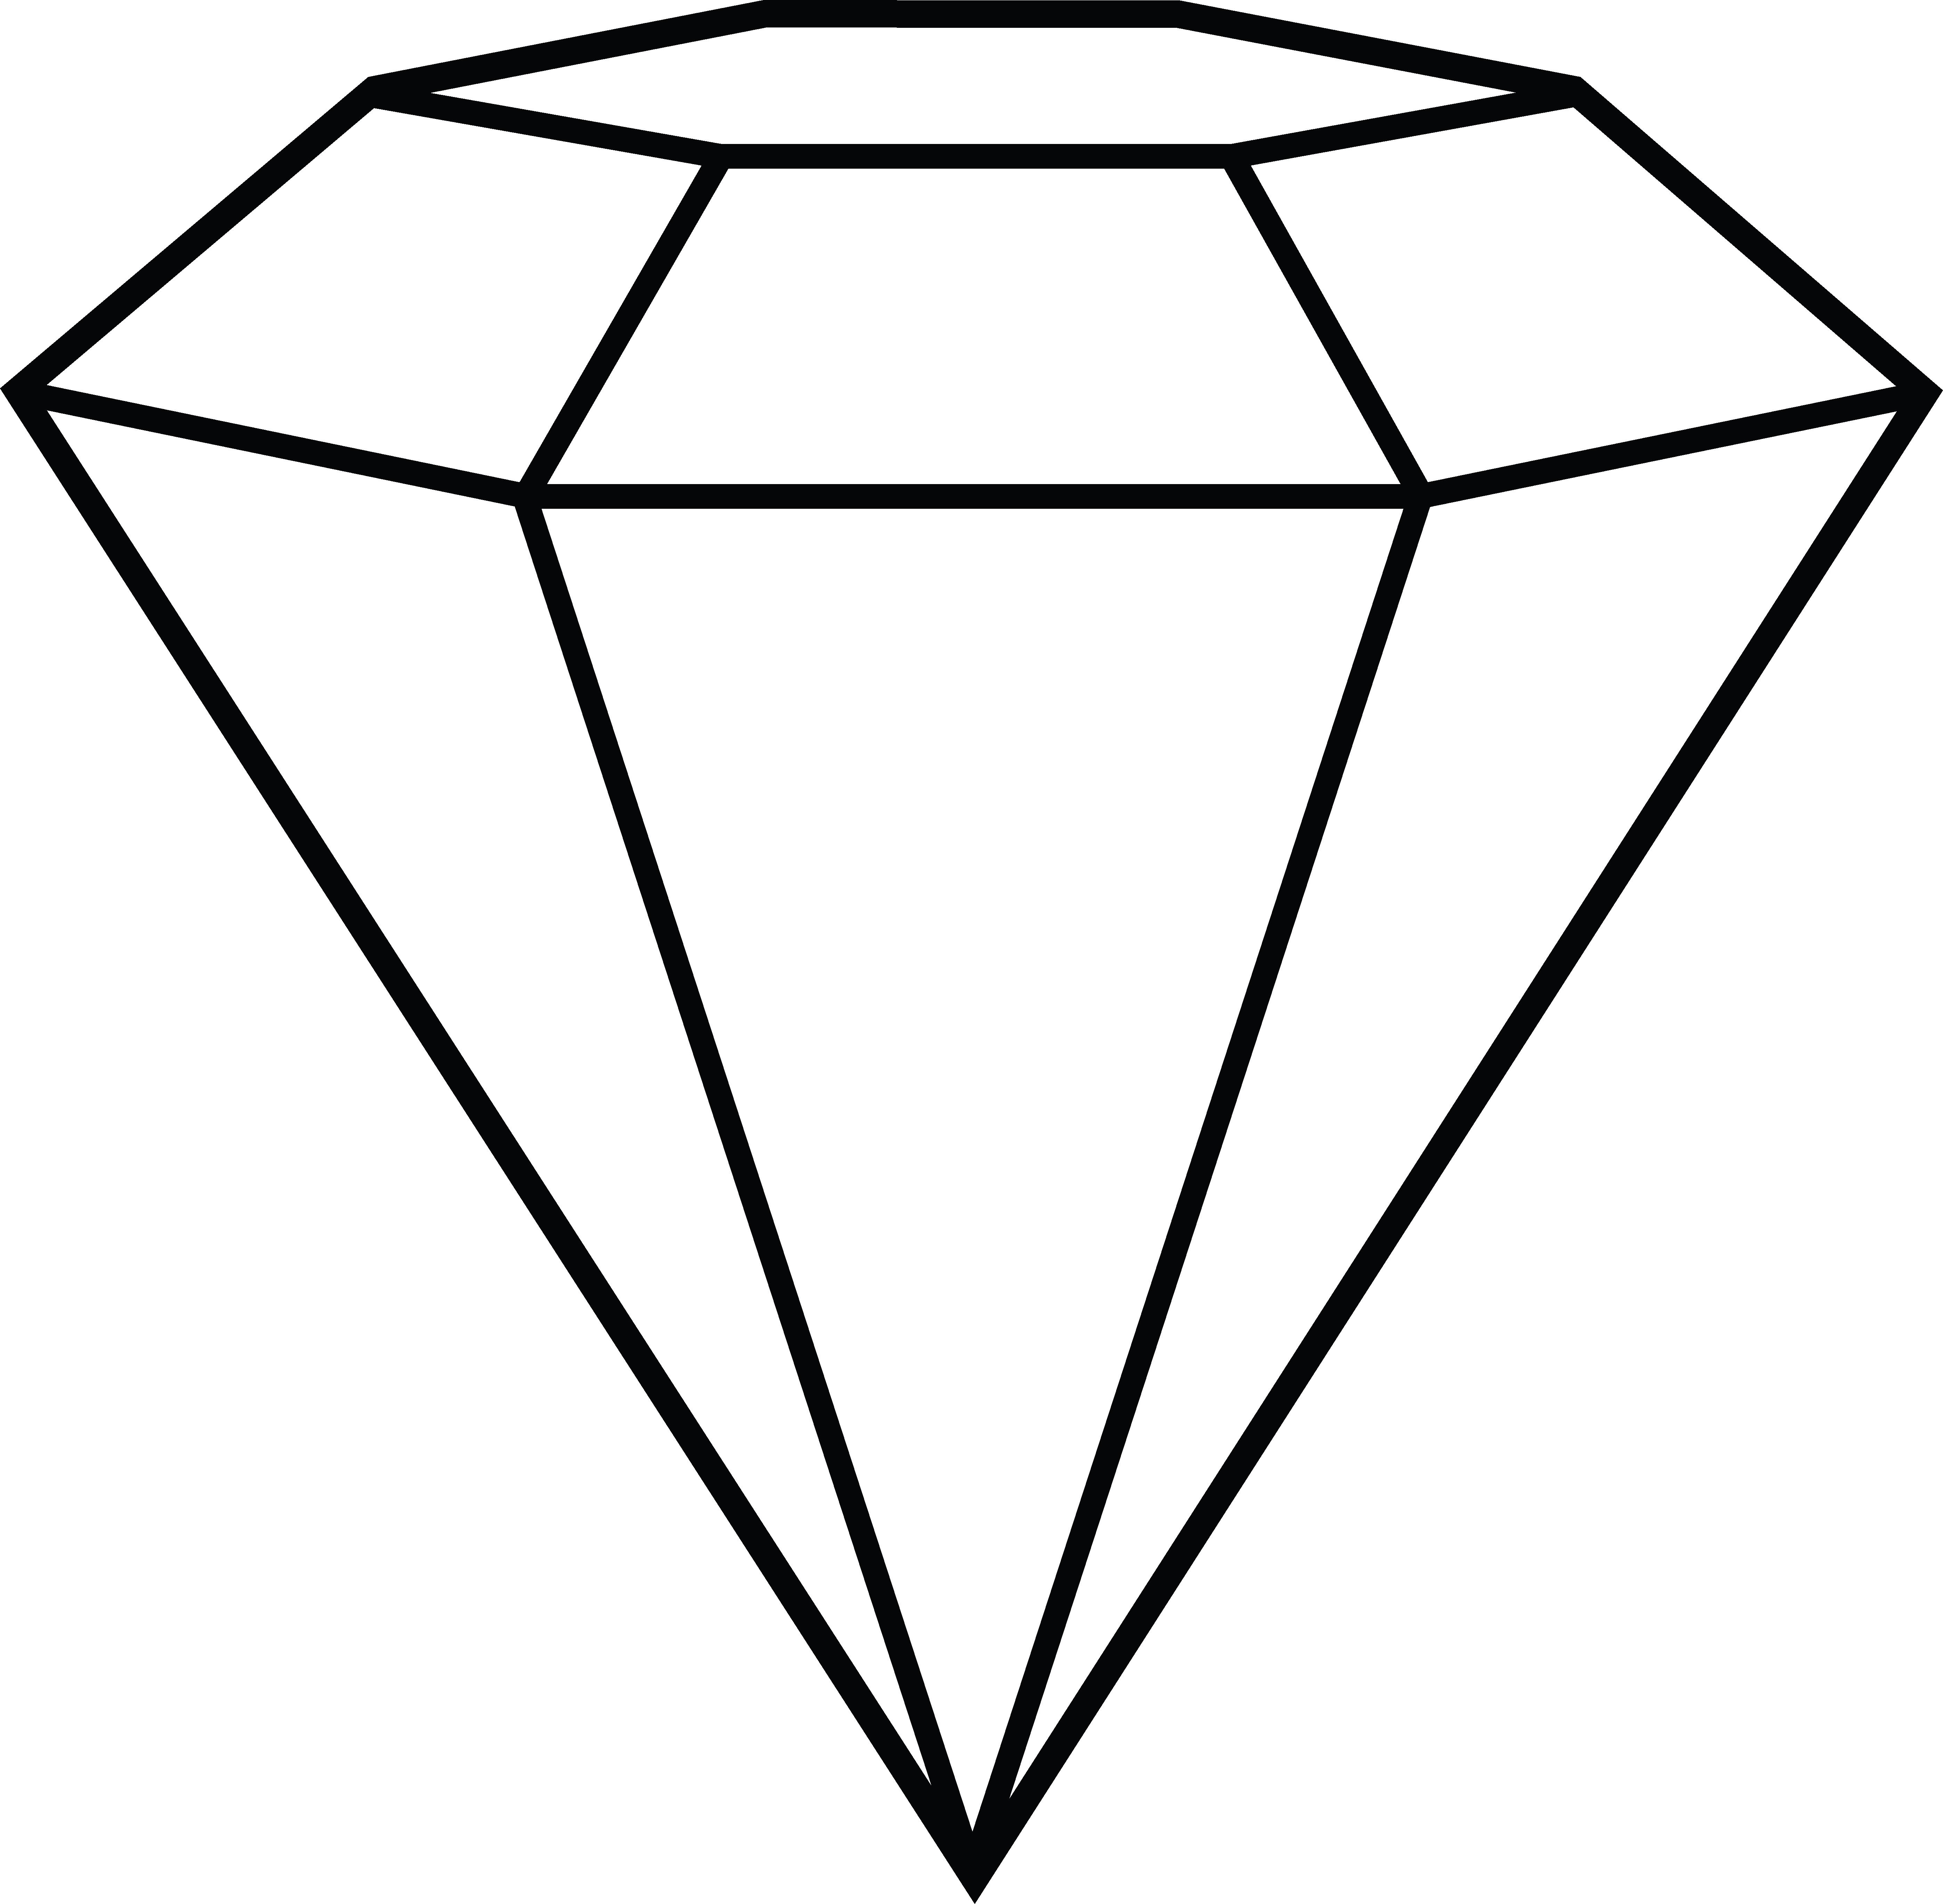 Diamond line art free clip art-Diamond line art free clip art-4